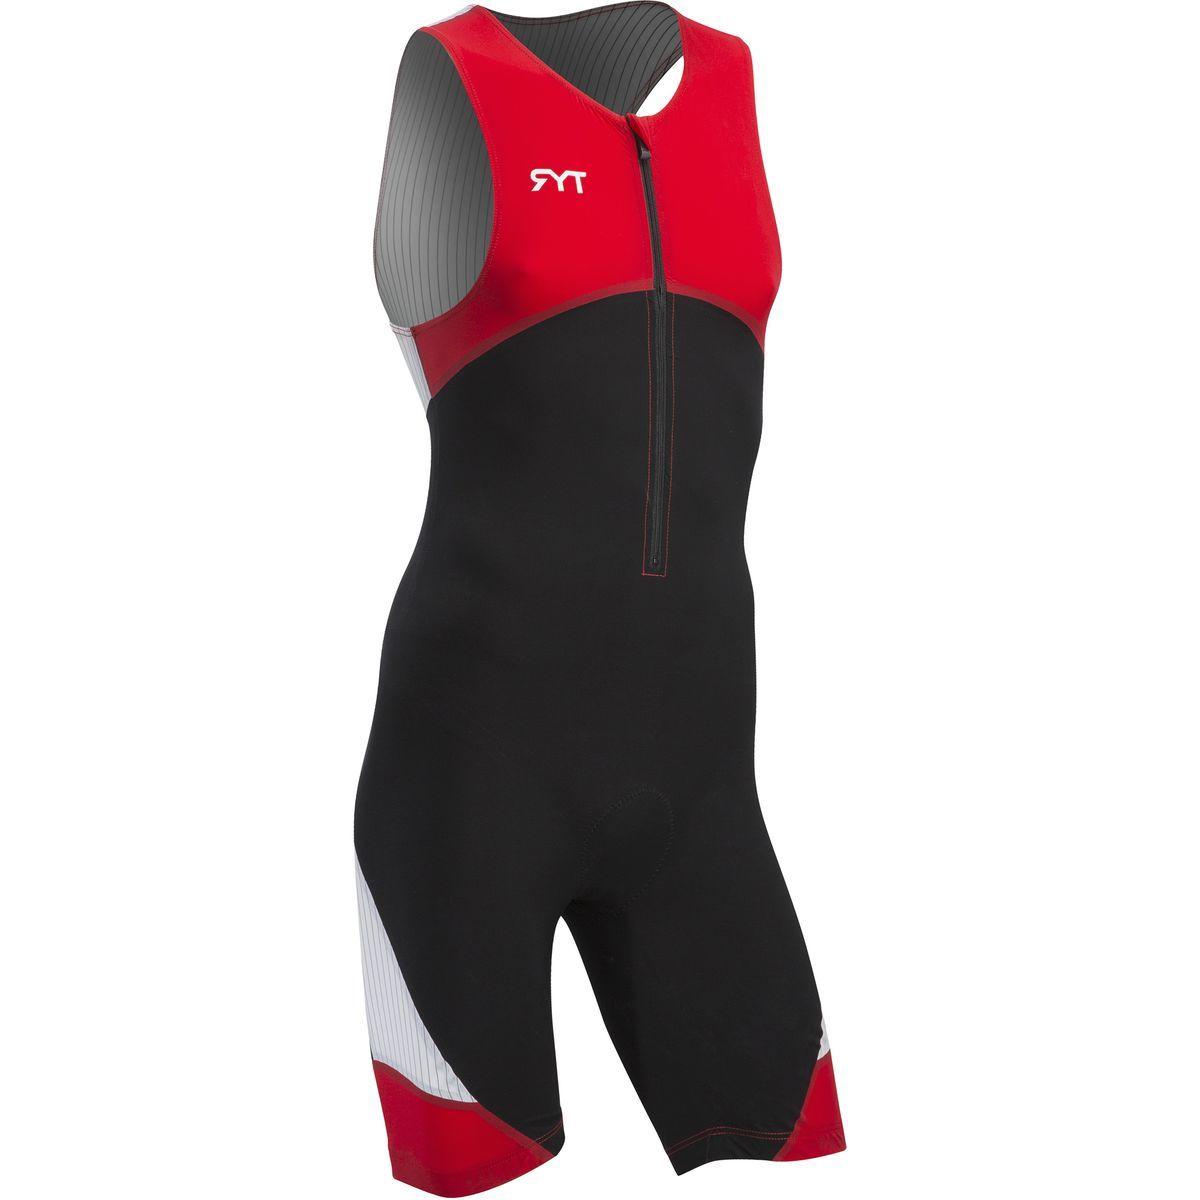 TYR Padded Carbon Front Zip Tri Suit - Men's